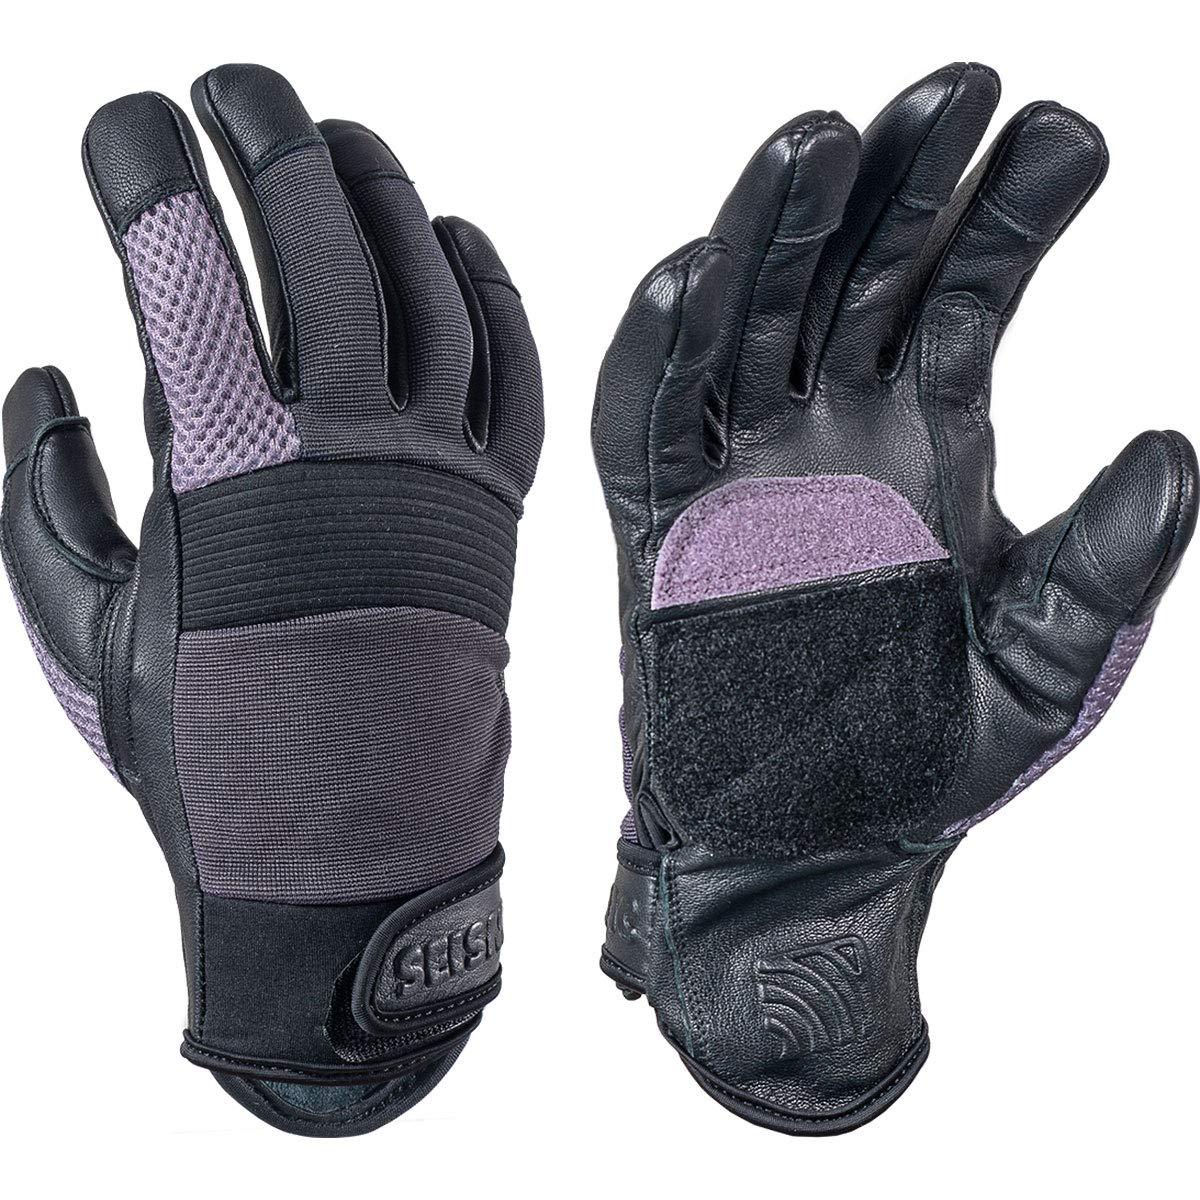 Seismic Freeride Gloves - Black/Purple - XS